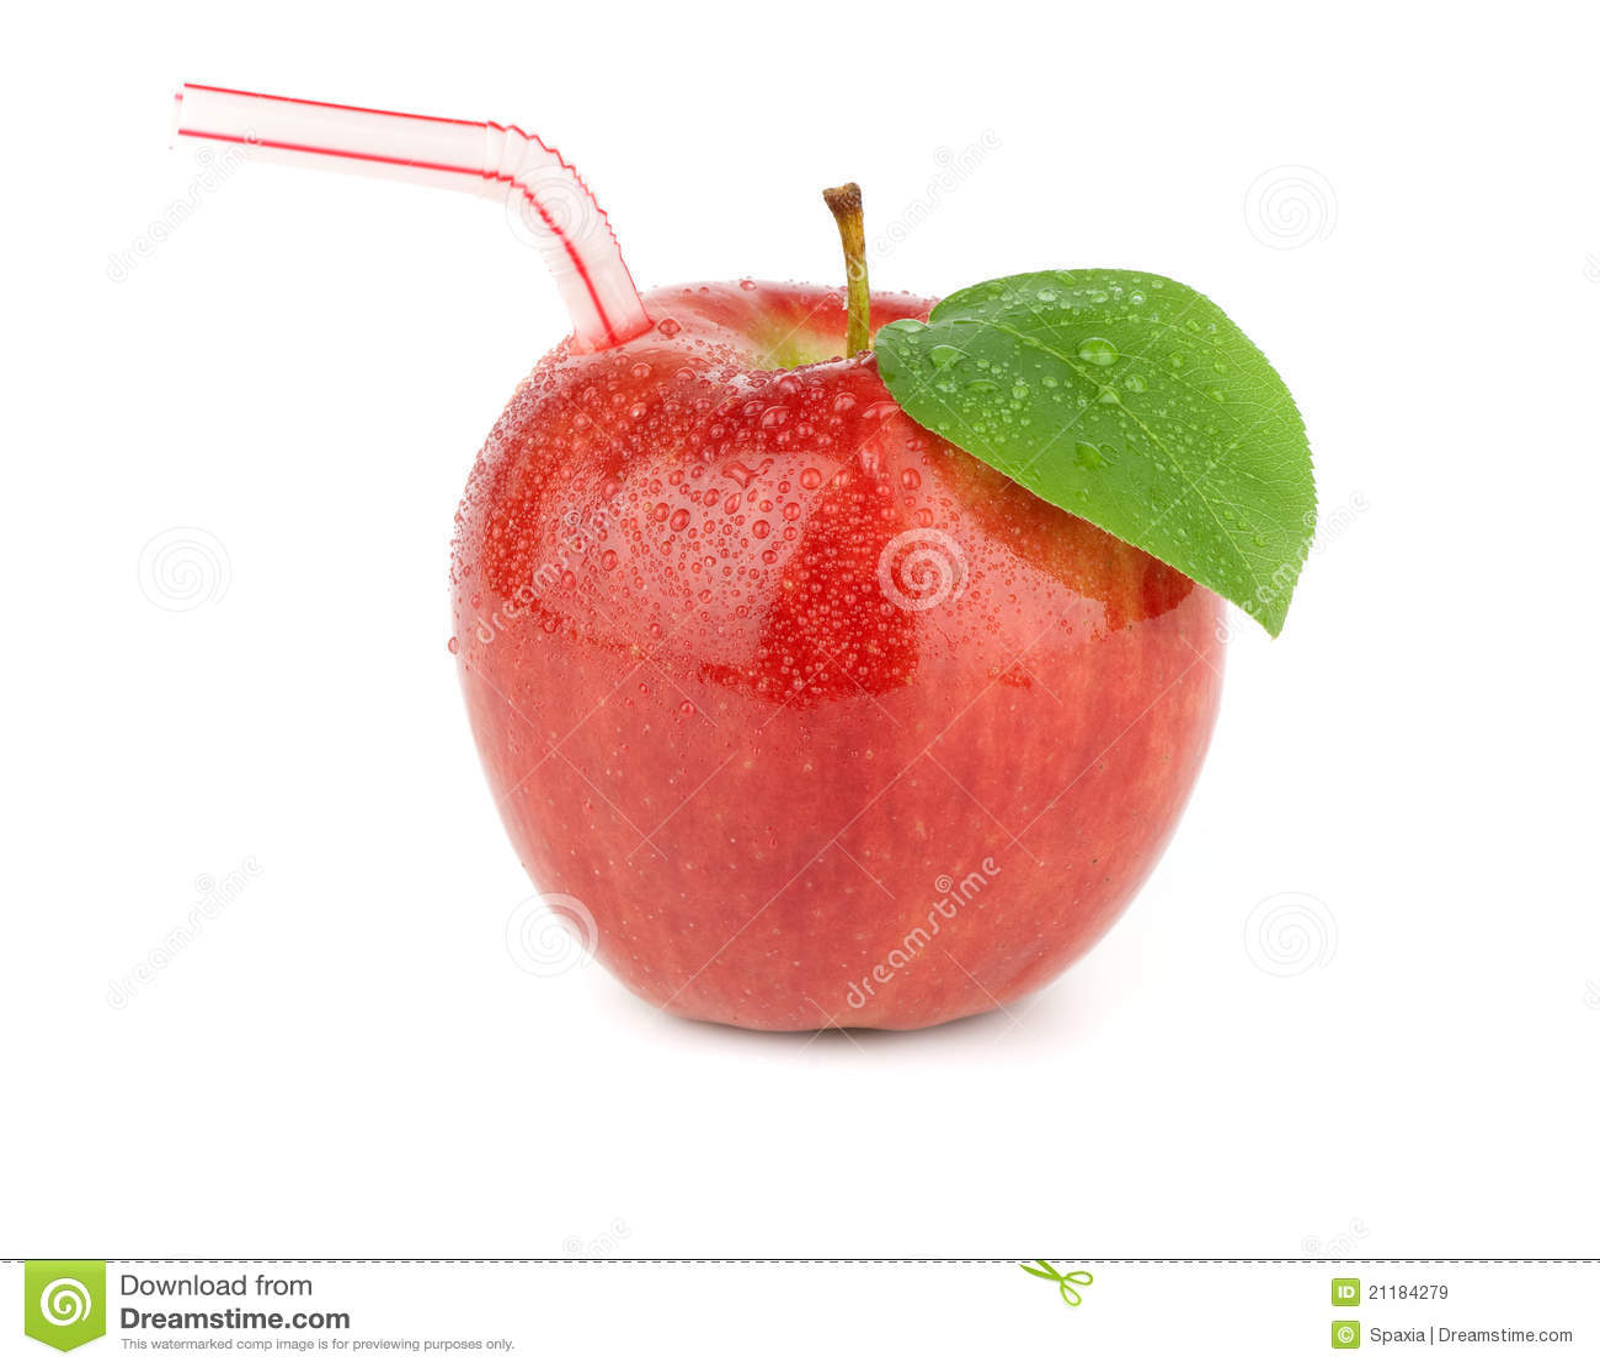 Ripe red apple juice